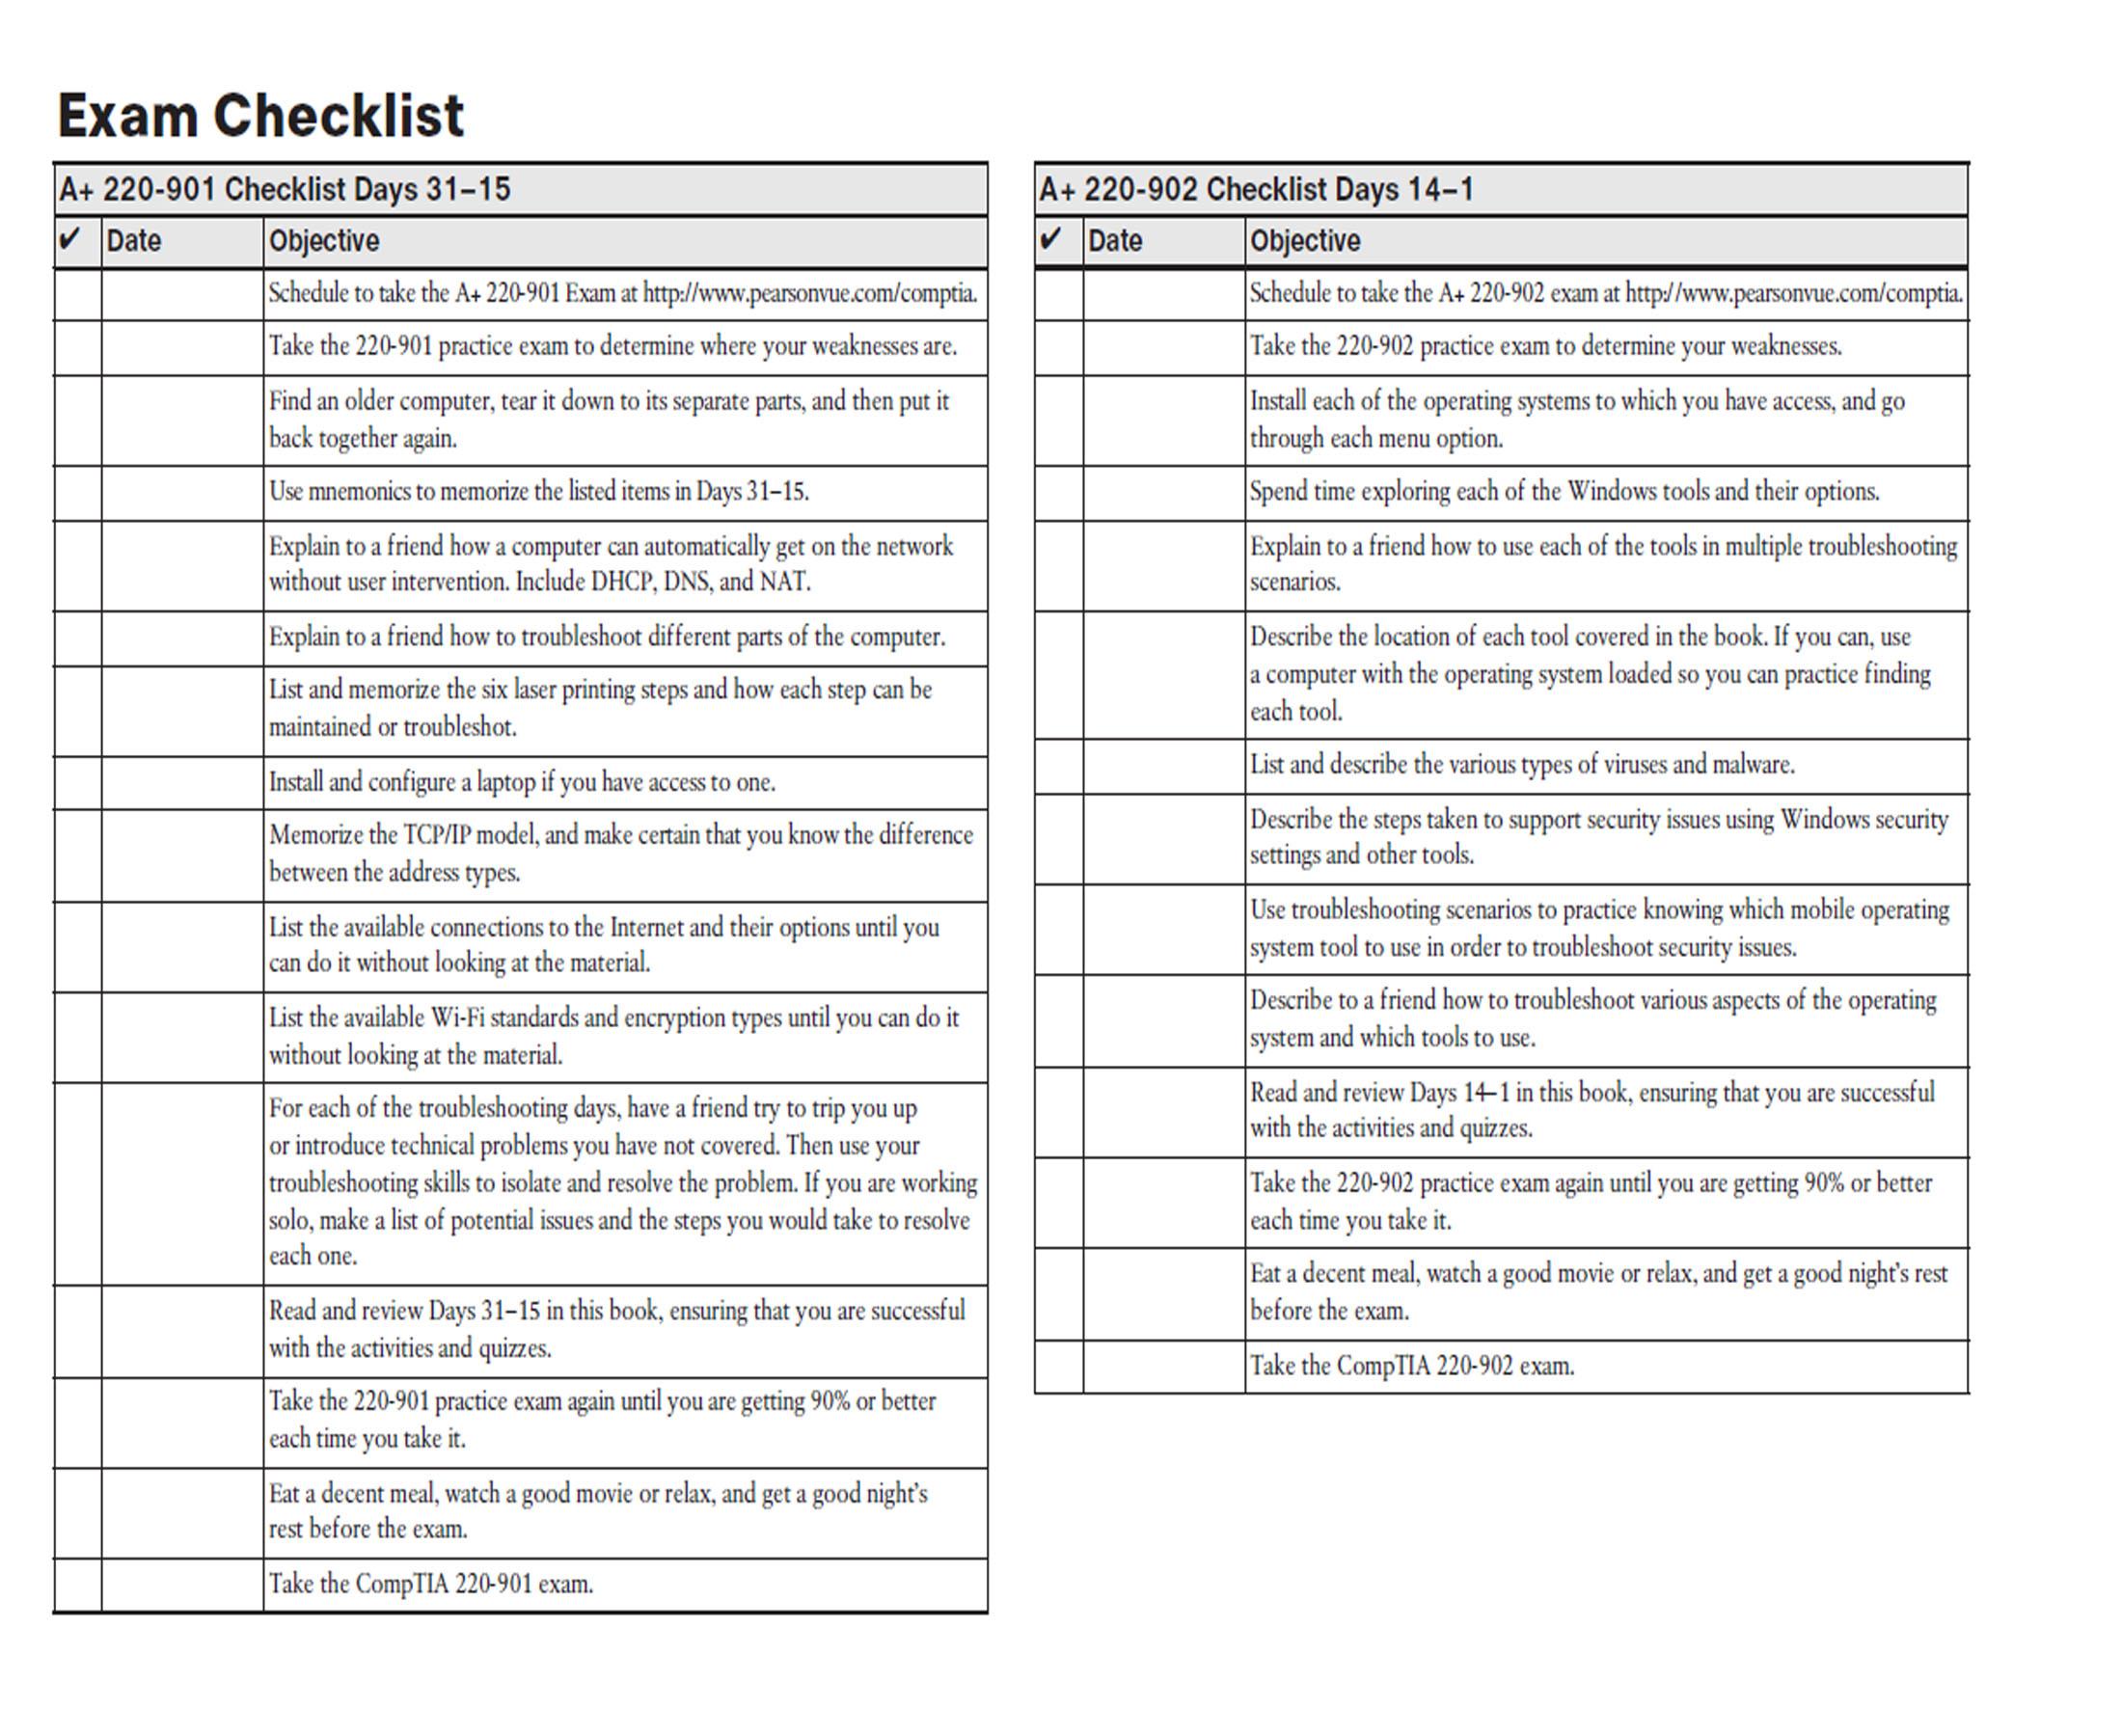 tkam study guide 20 31 To kill a mockingbird study guide  sullivanenglishiweeblycom/tkam-study-guide-for-chapters  kill a mockingbird chapters 22-31 chapter 22 1 ch 3 study guide 1.